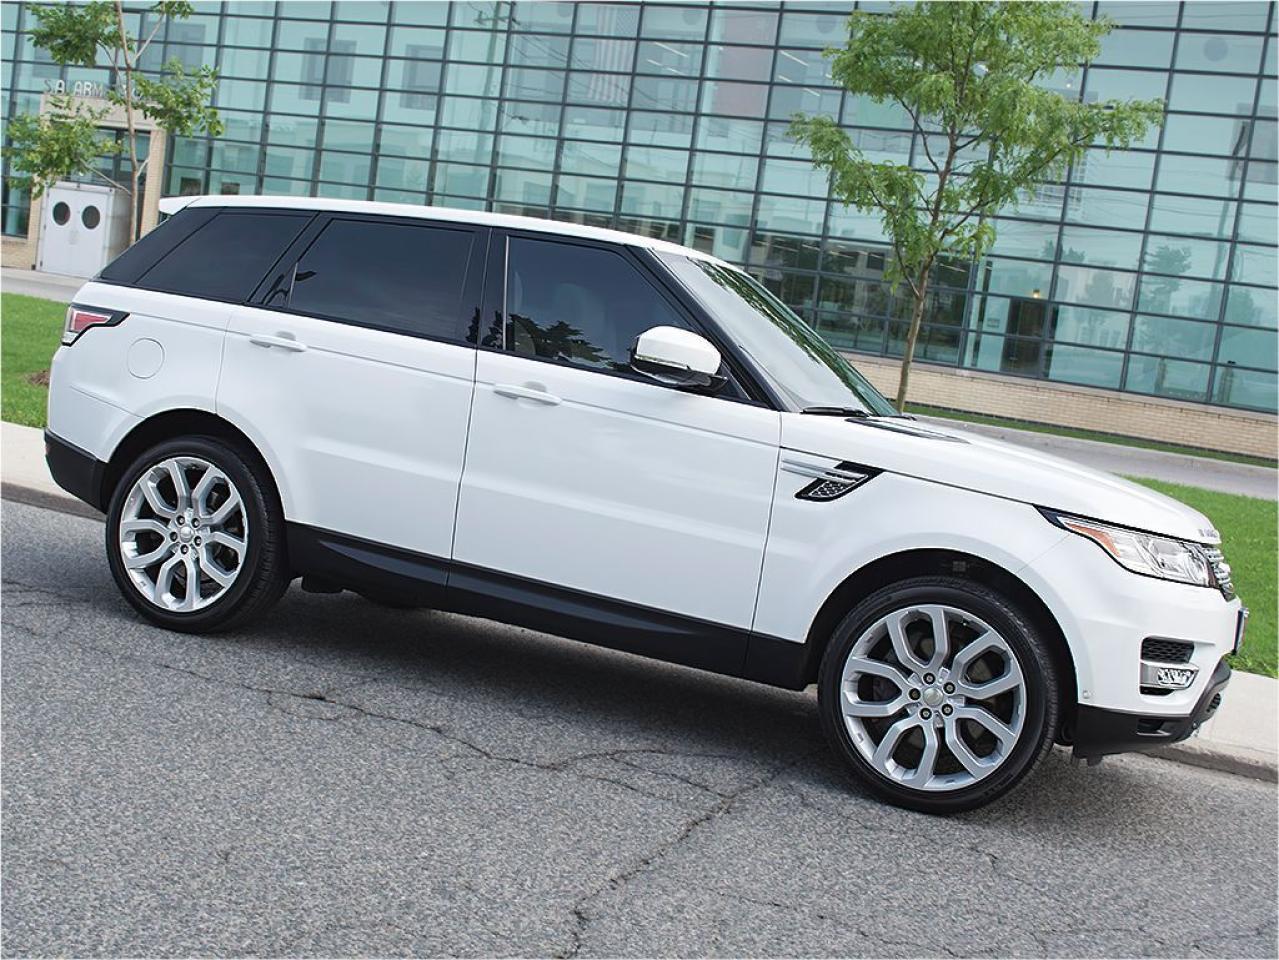 2014 Land Rover Range Rover Sport V8|SC|NAVI|DUAL DVD|360 CAMERA|22 inch ALLOYS